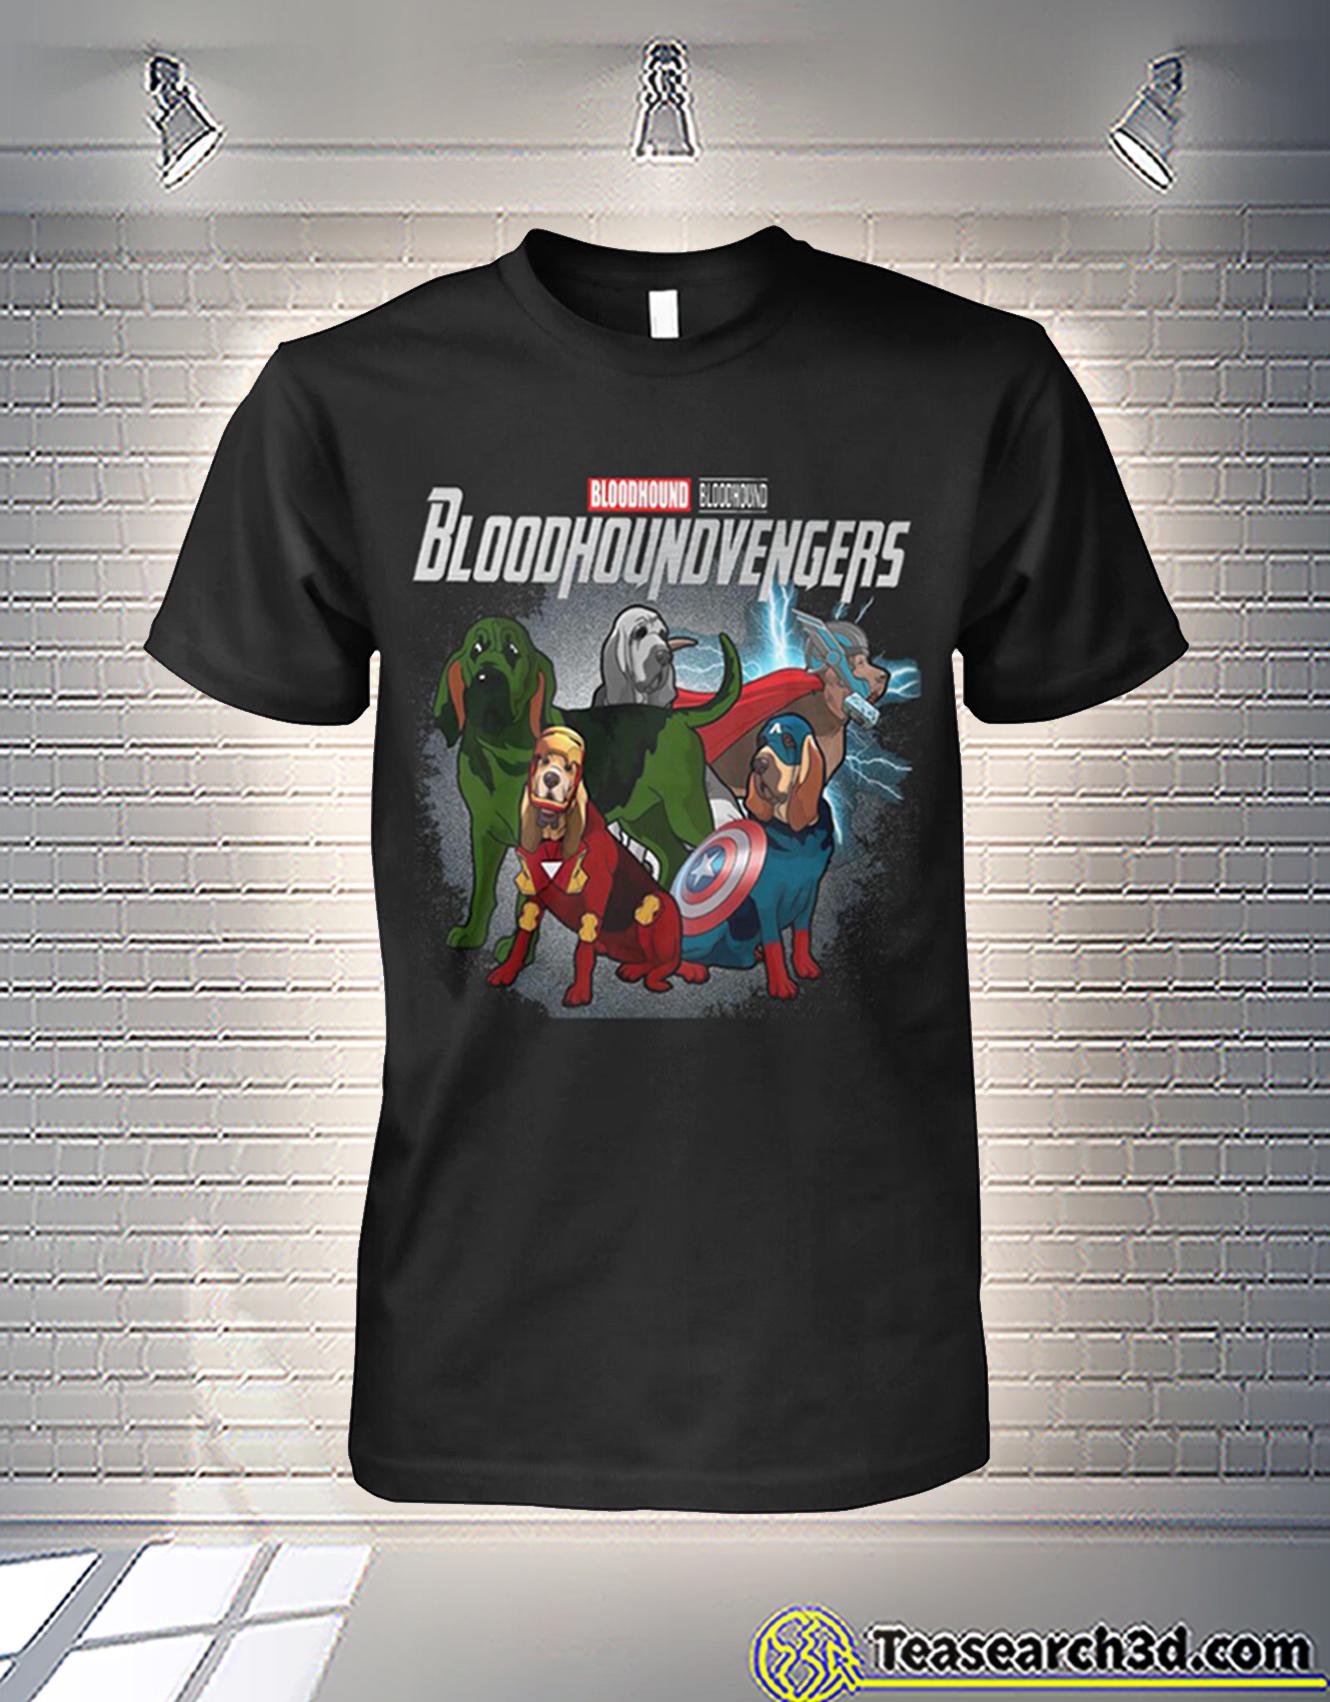 Bloodhound bloodhound bloodhoundvengers avengers shirt